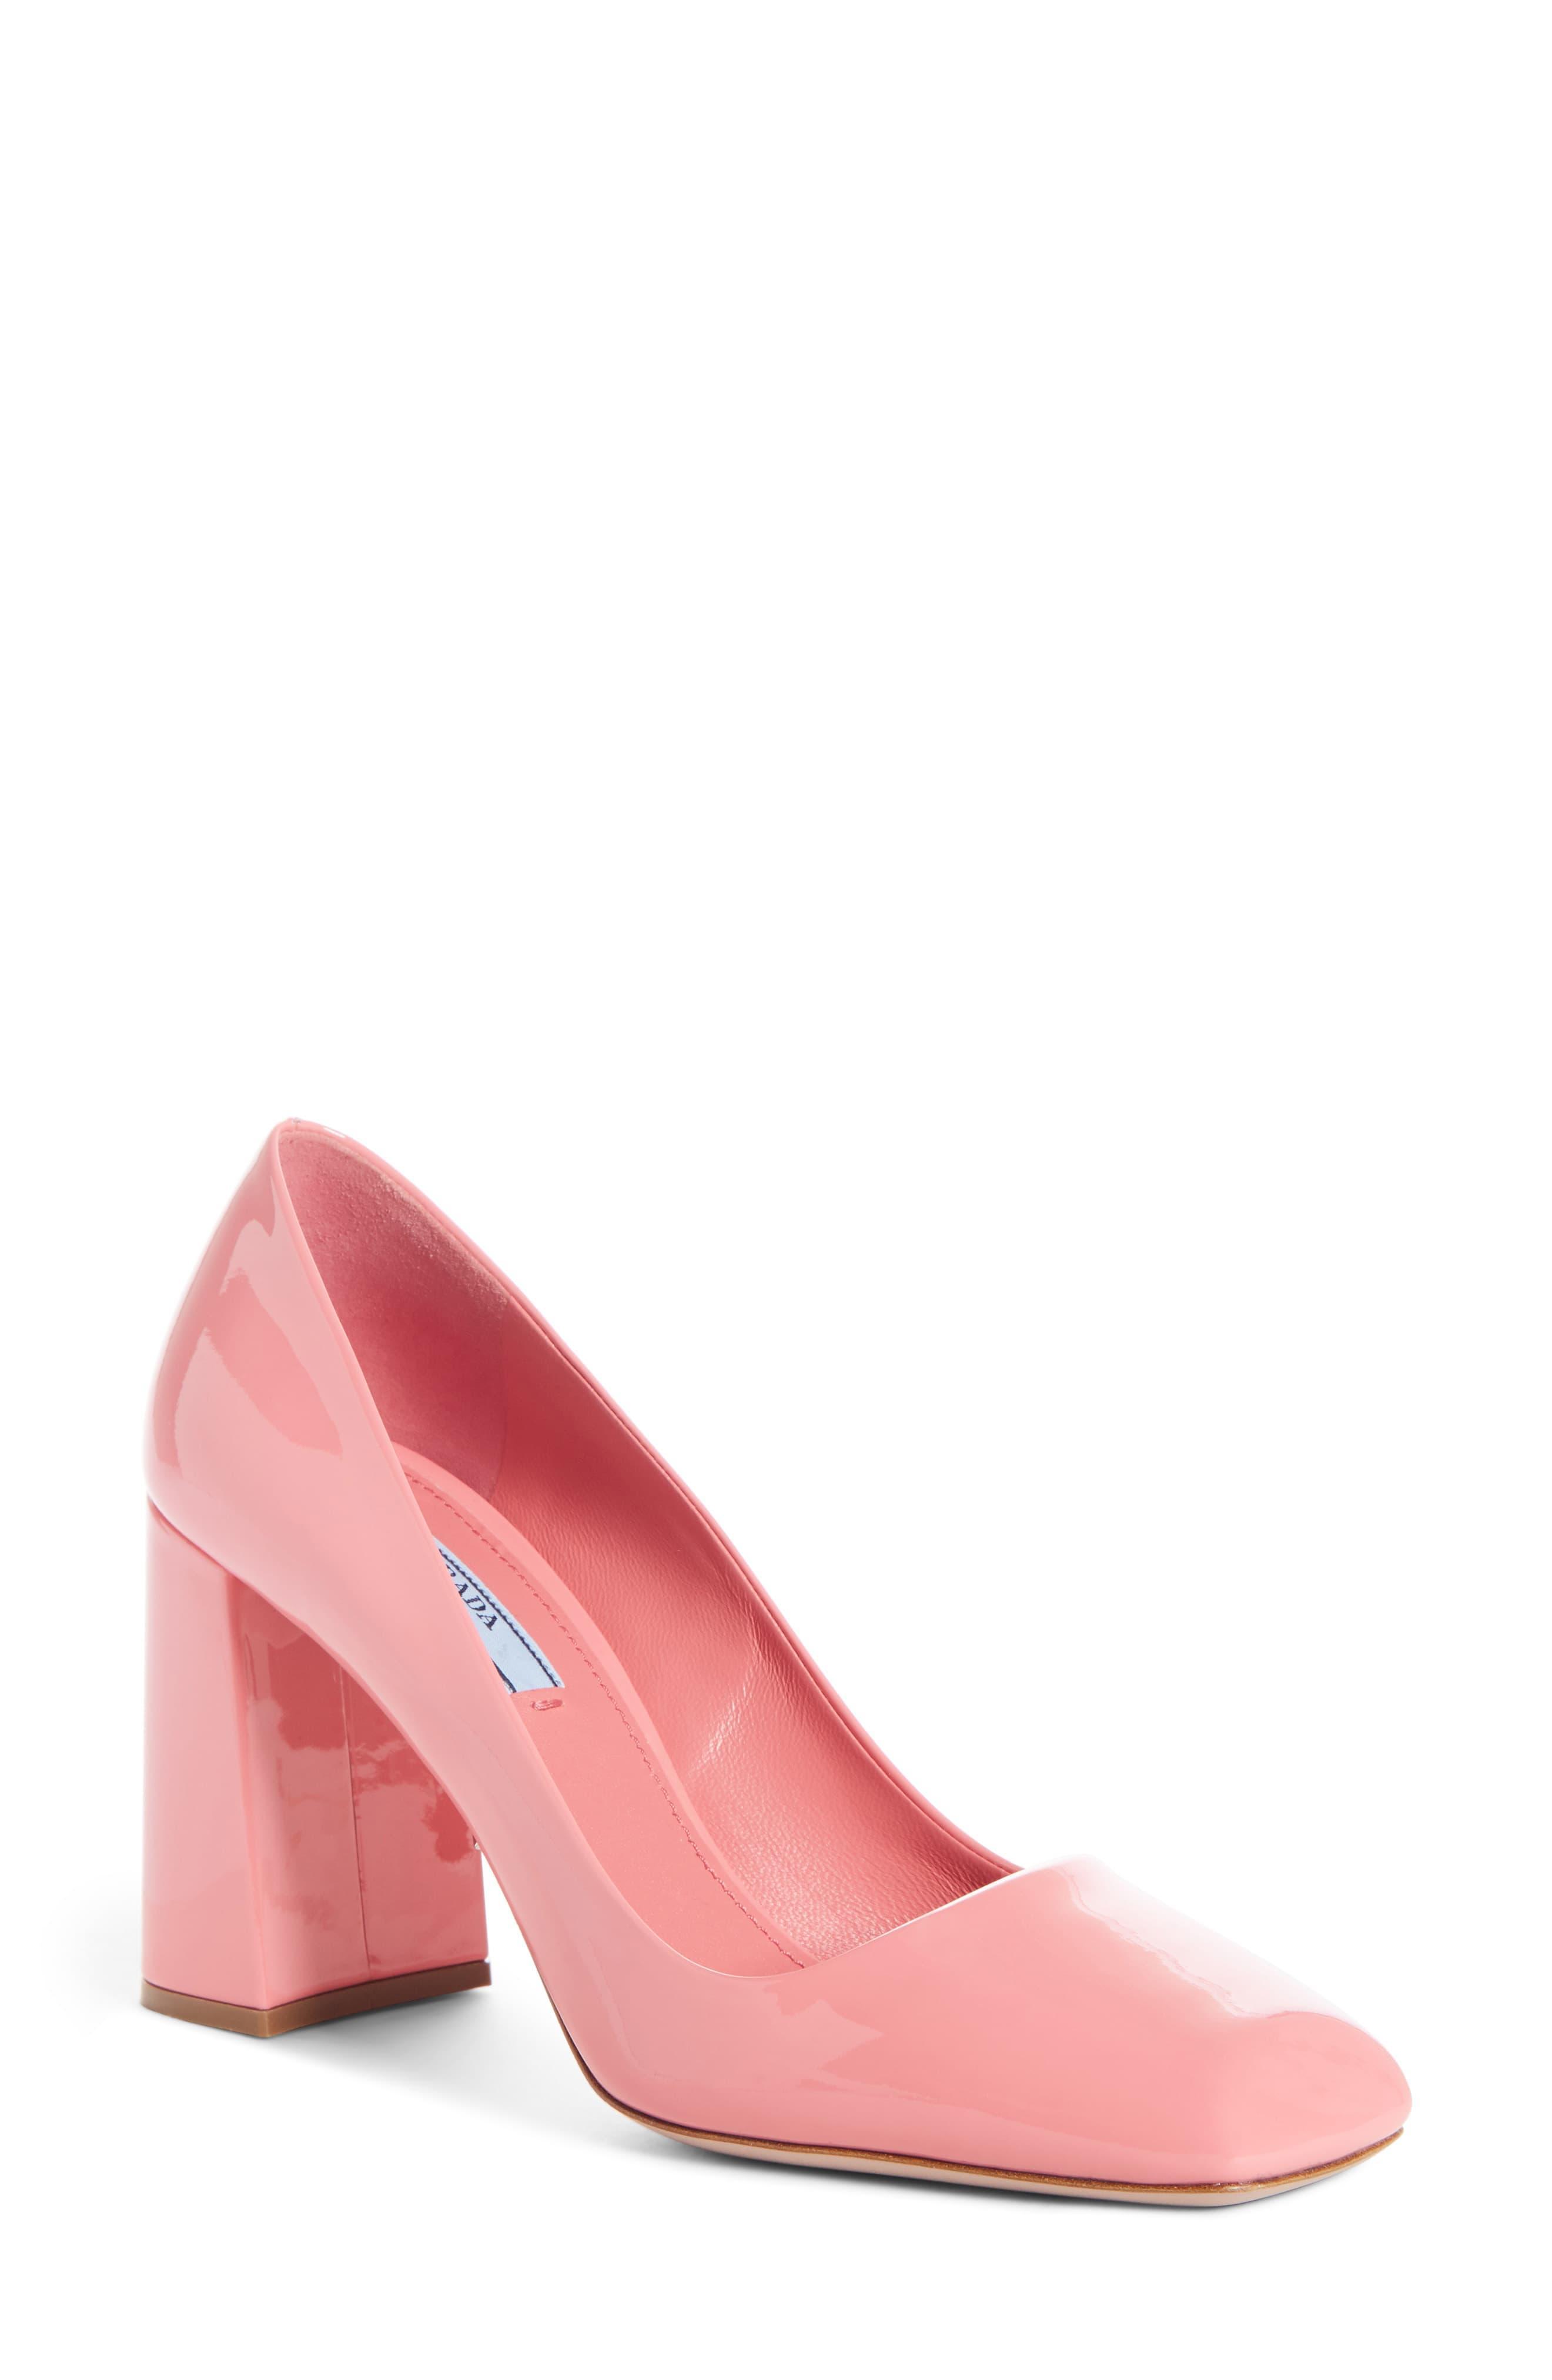 prada pink pumps